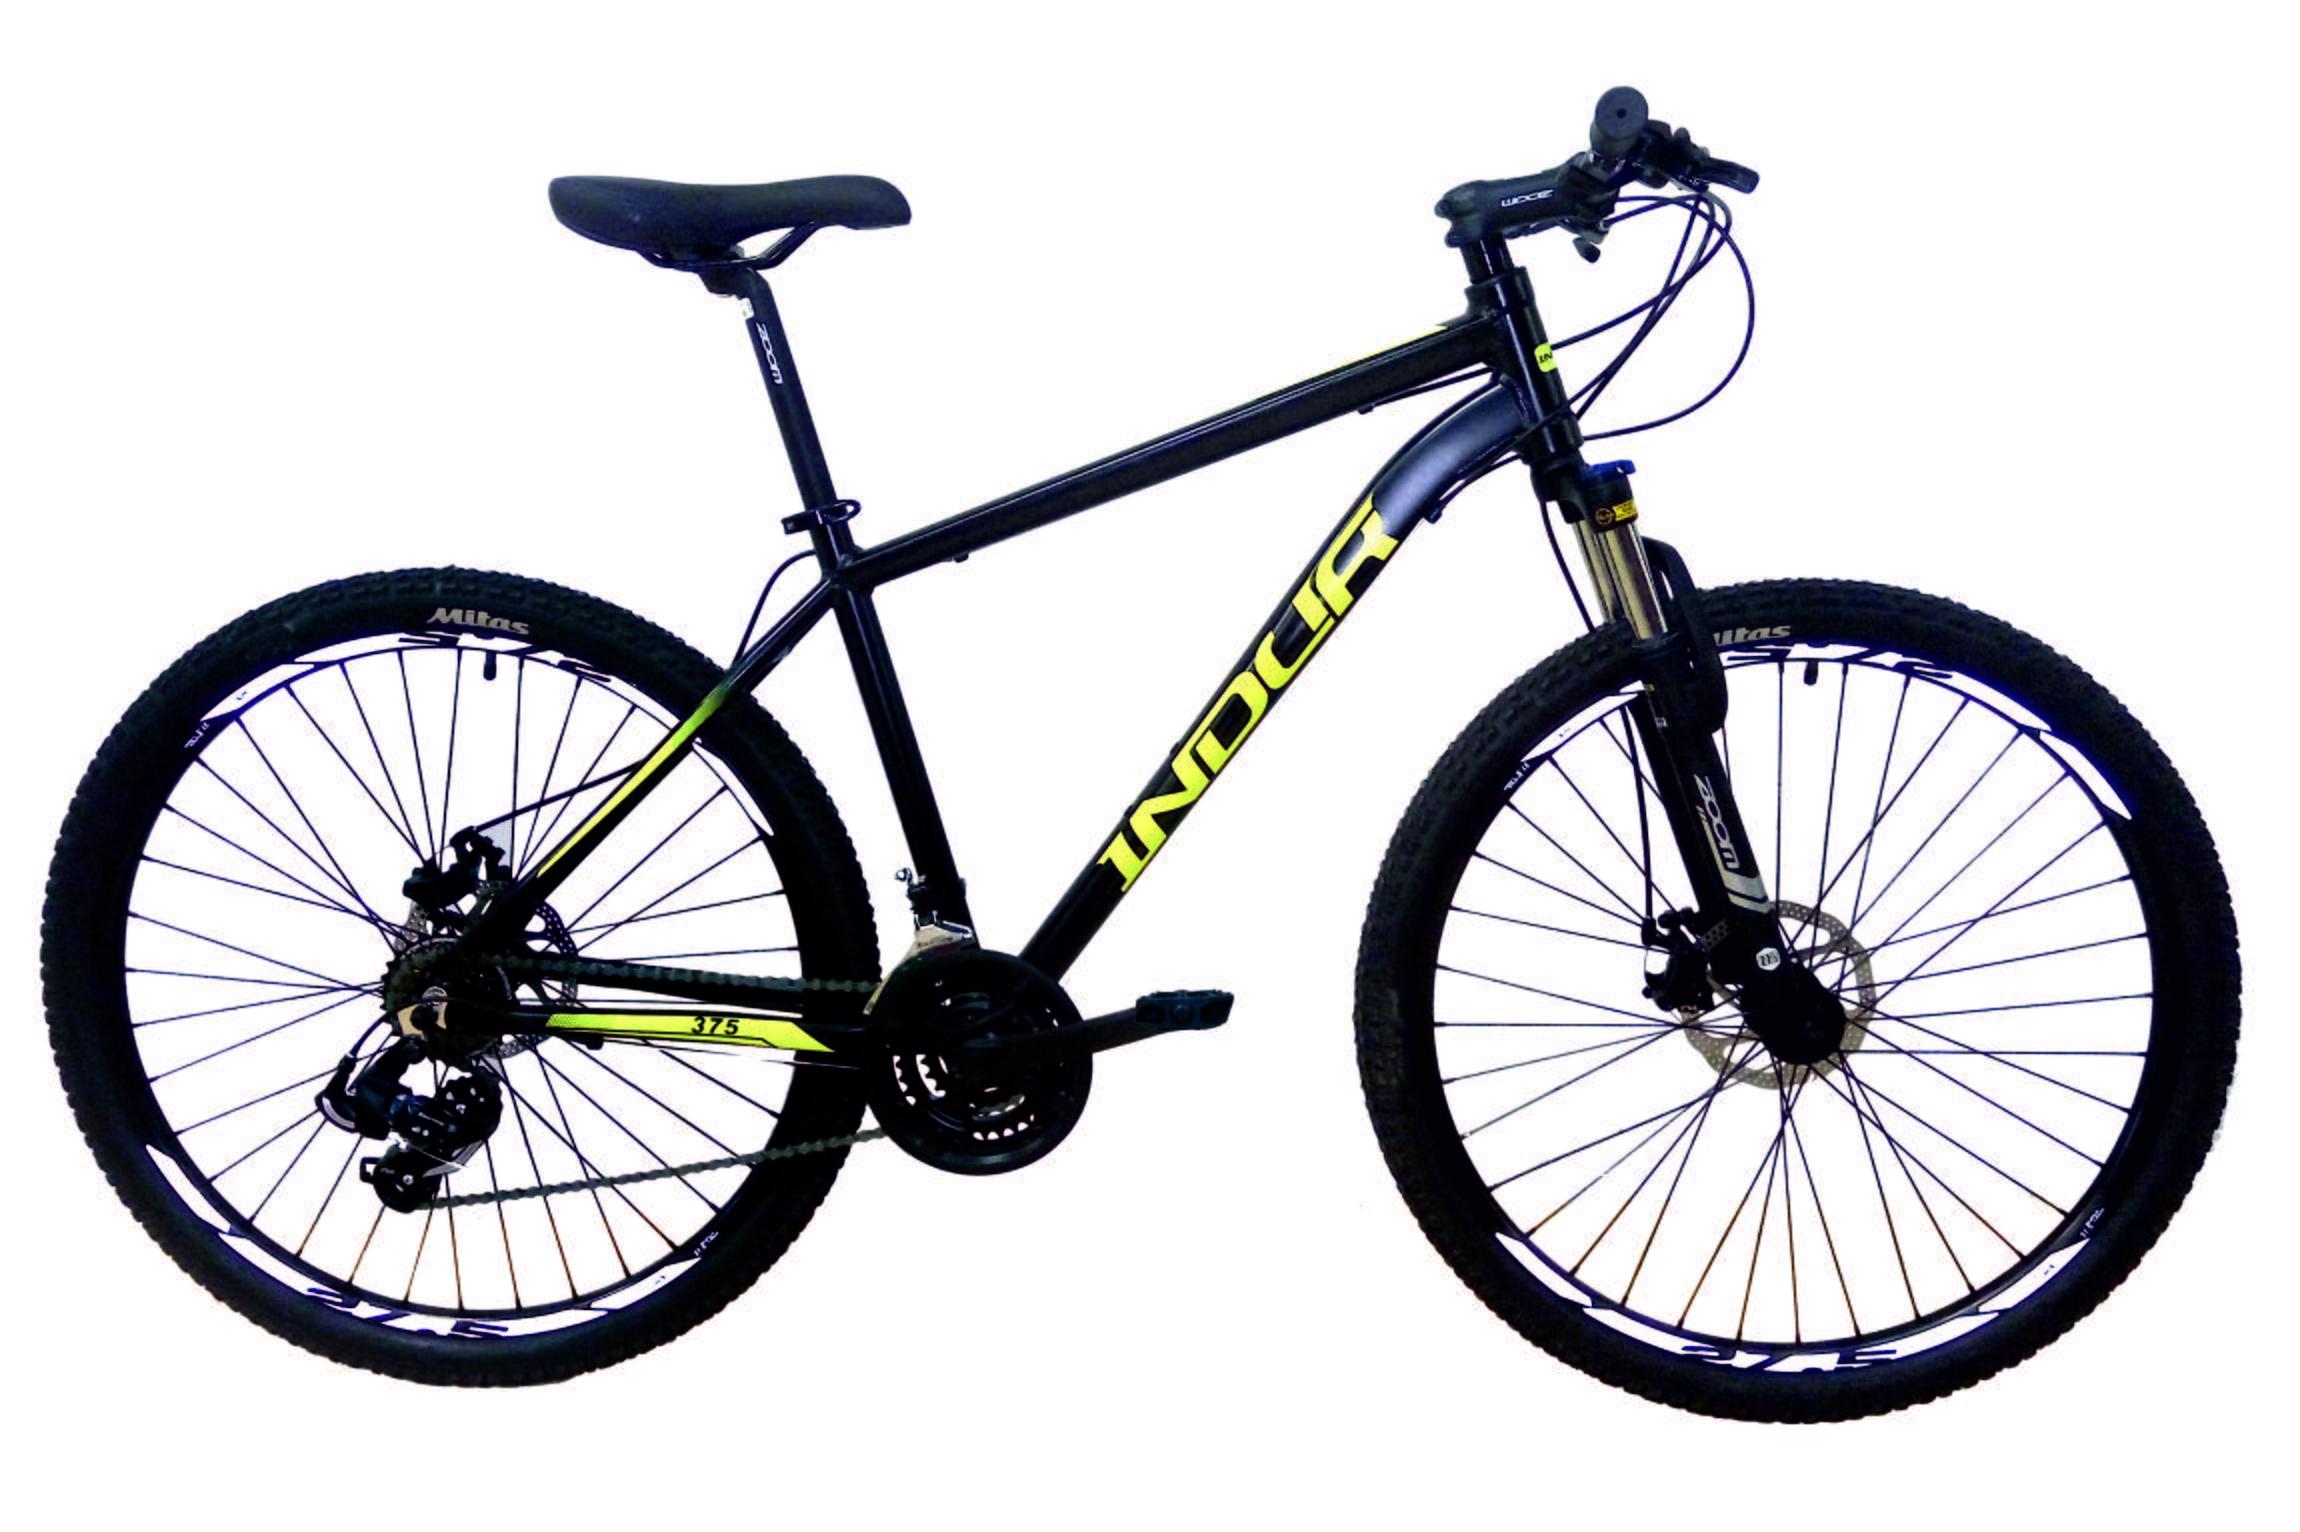 Indur Negra Mens Mountain Bike - 27.5 Inch Large